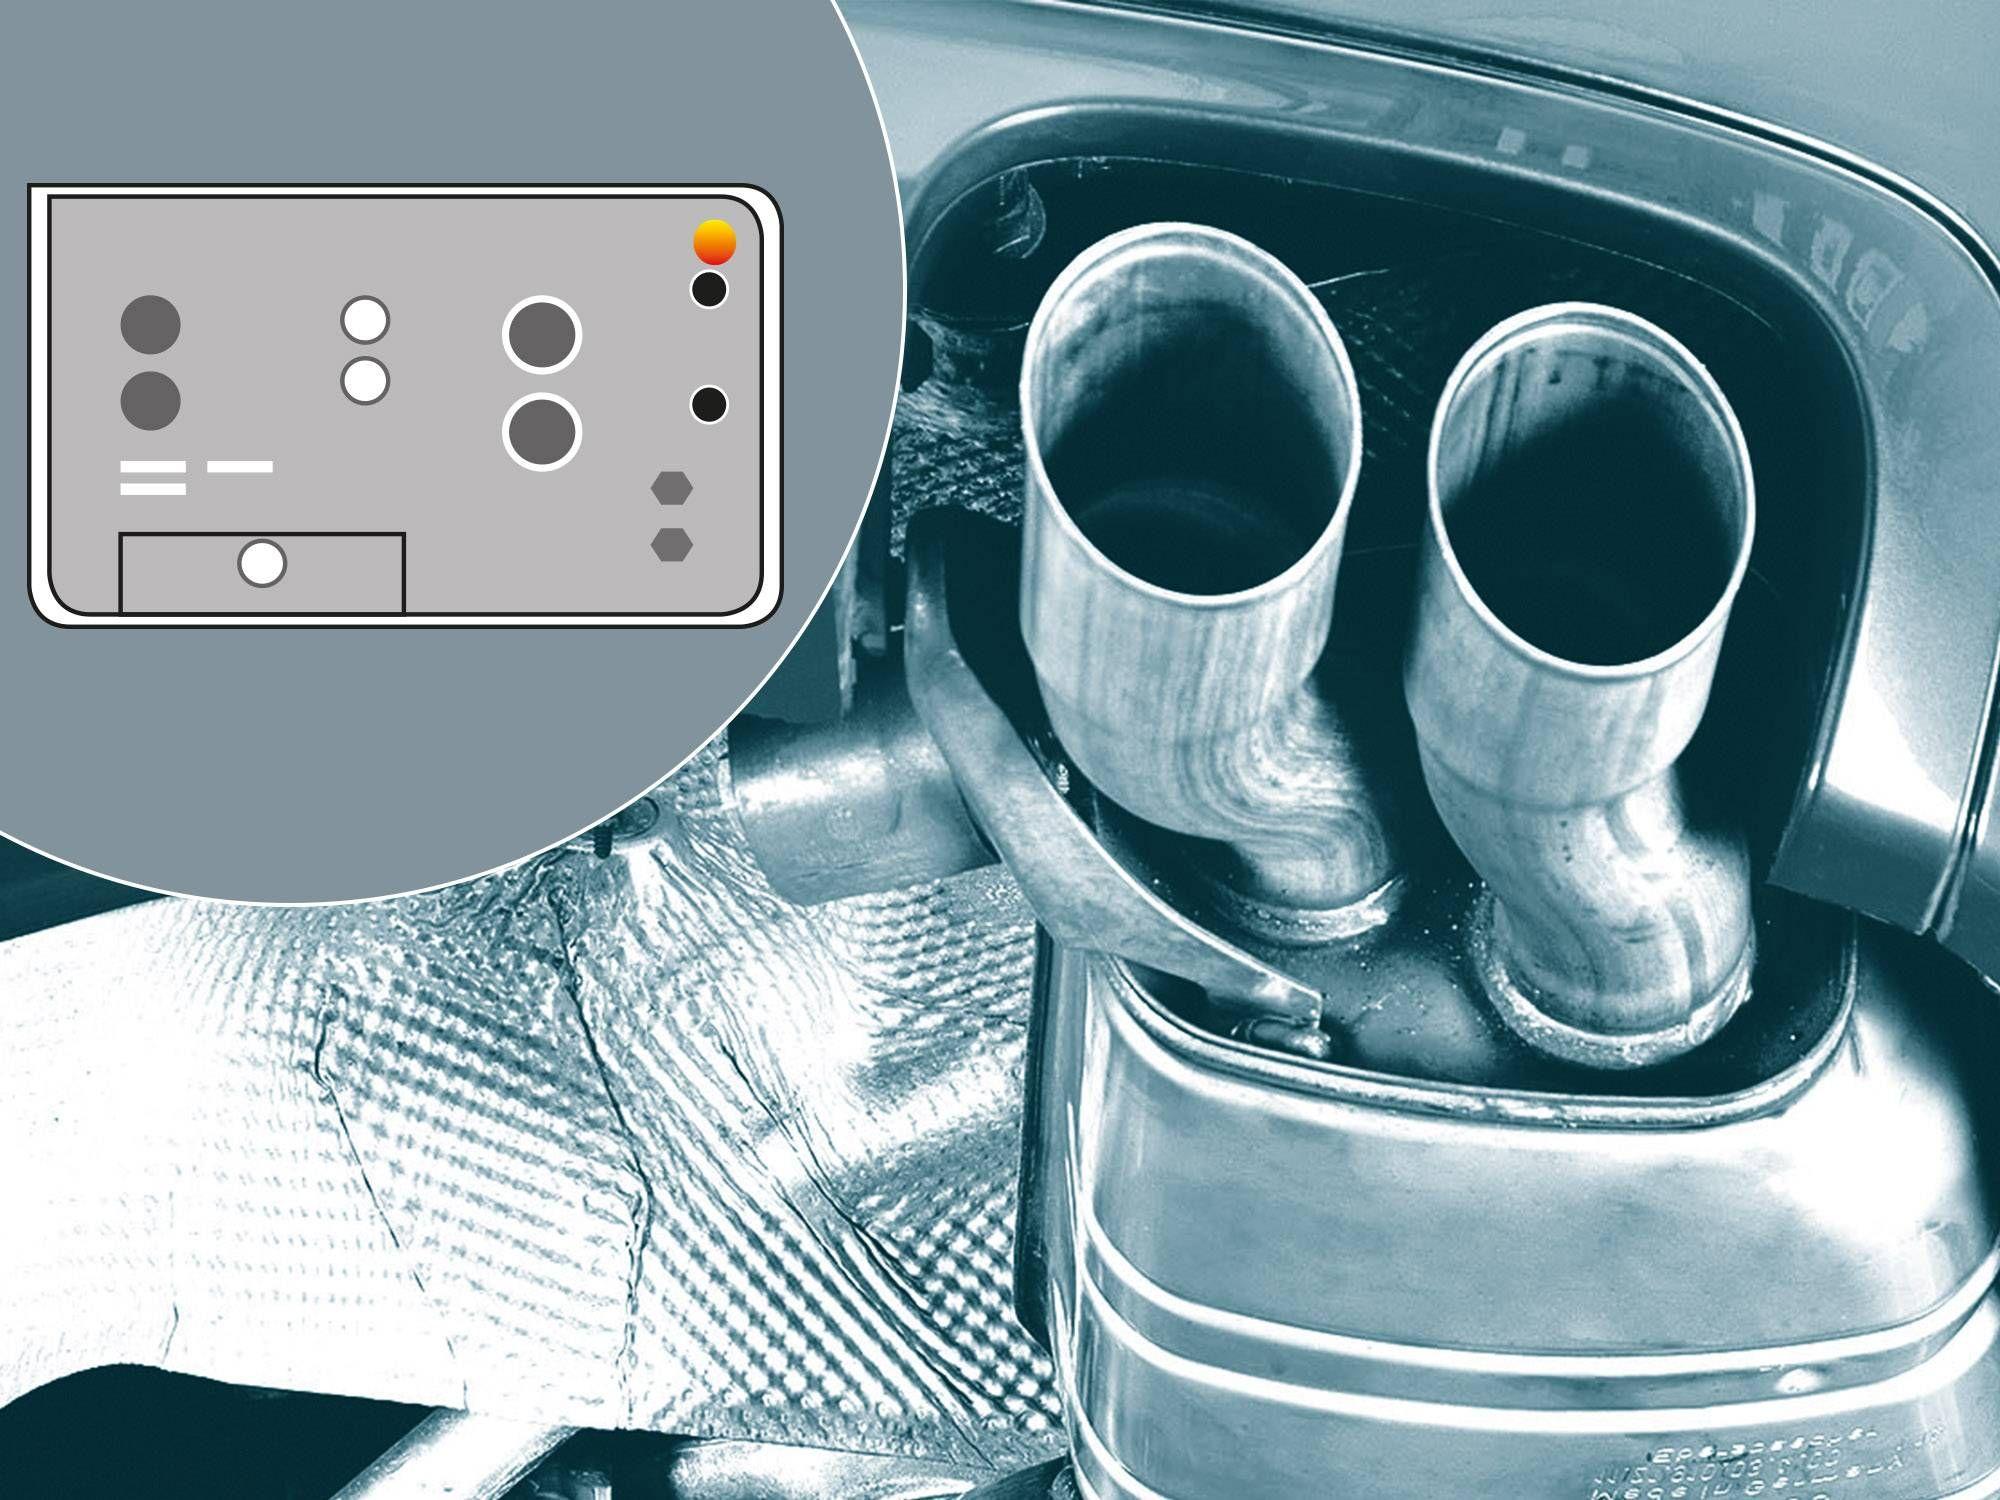 testo-nanomet3-abgas-partikel-analyse-abgasrohr.jpg